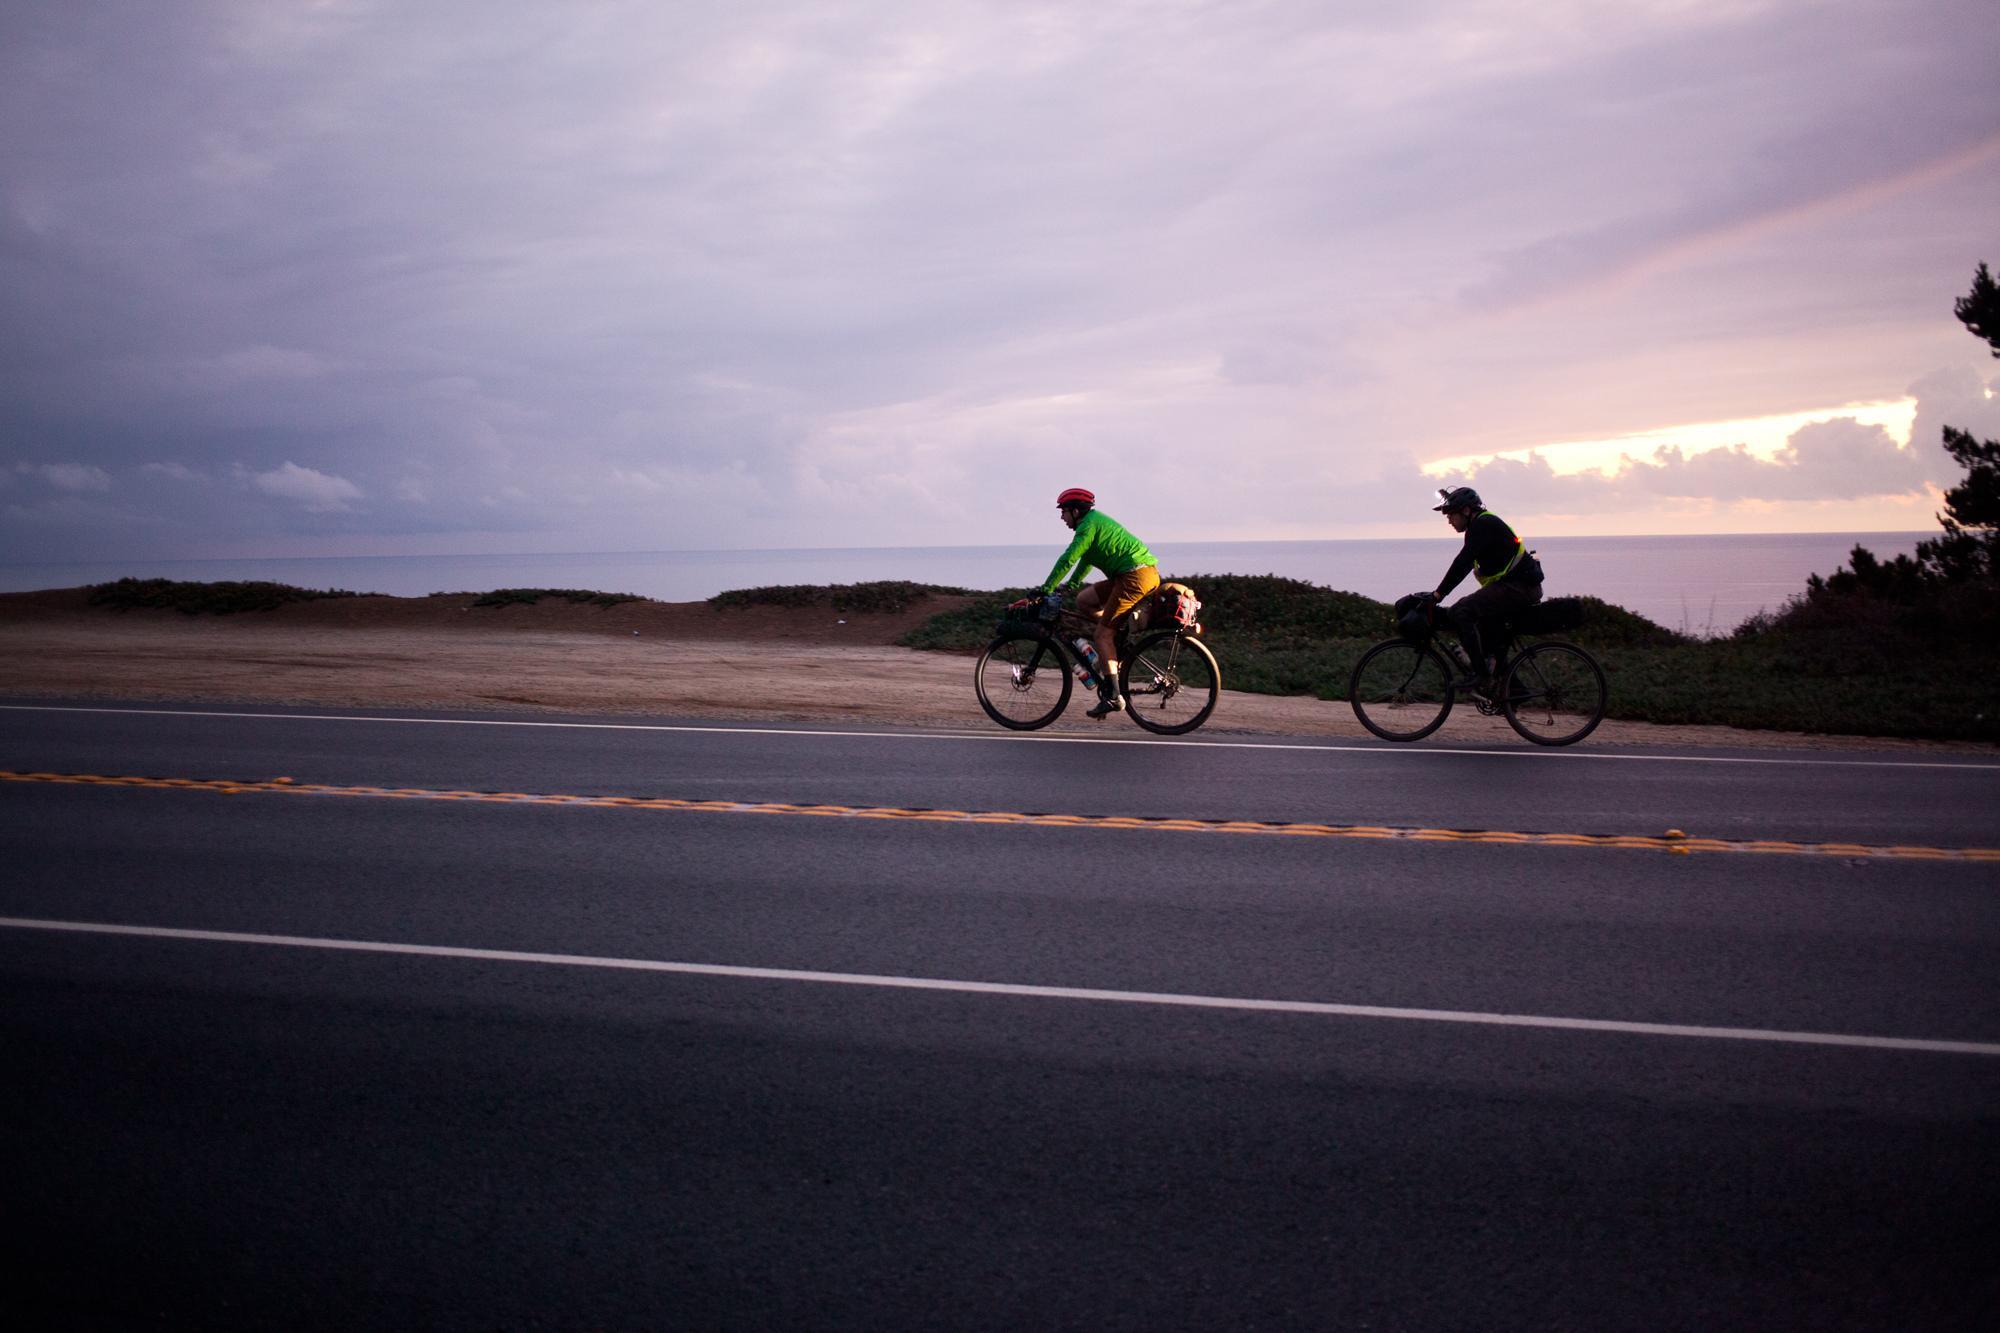 Bikepacking with BMXers on Cross Bikes in the Santa Cruz Mountains